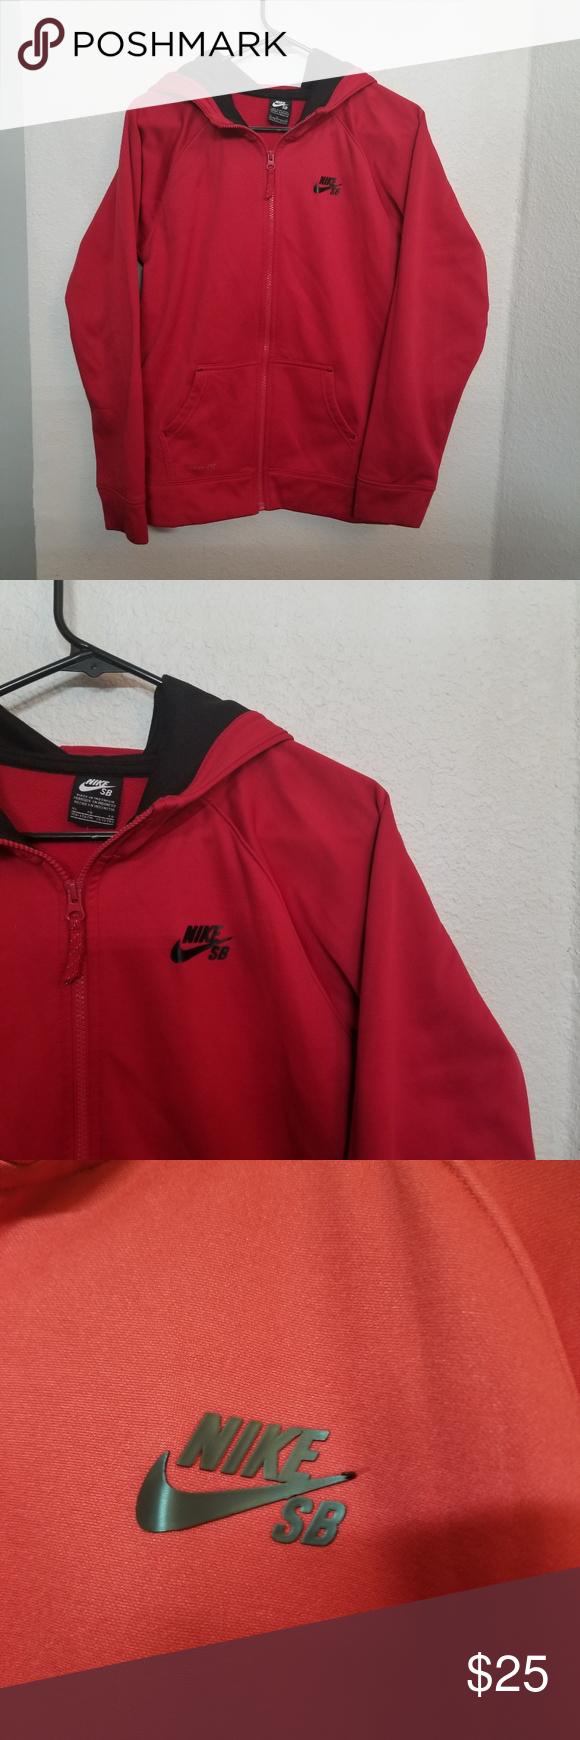 Predownload: Nike Sb Zip Up Hoodie Brand New Dri Fit Material Nike Sb Hoodies Sweatshirt Shirt [ 1740 x 580 Pixel ]